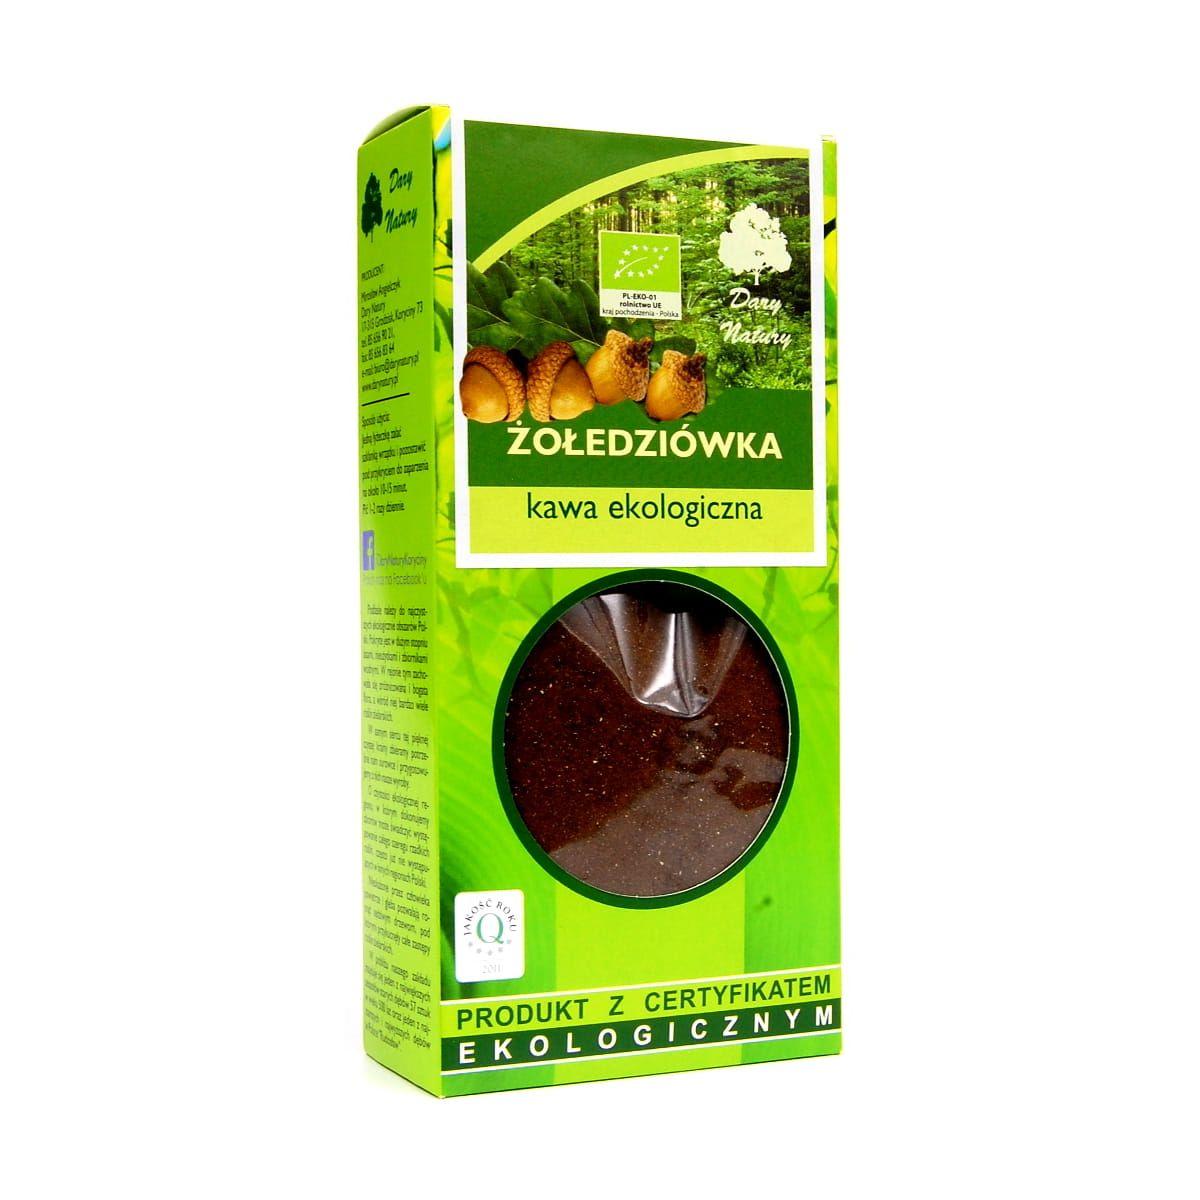 Kawa żołędziówka EKO 100g